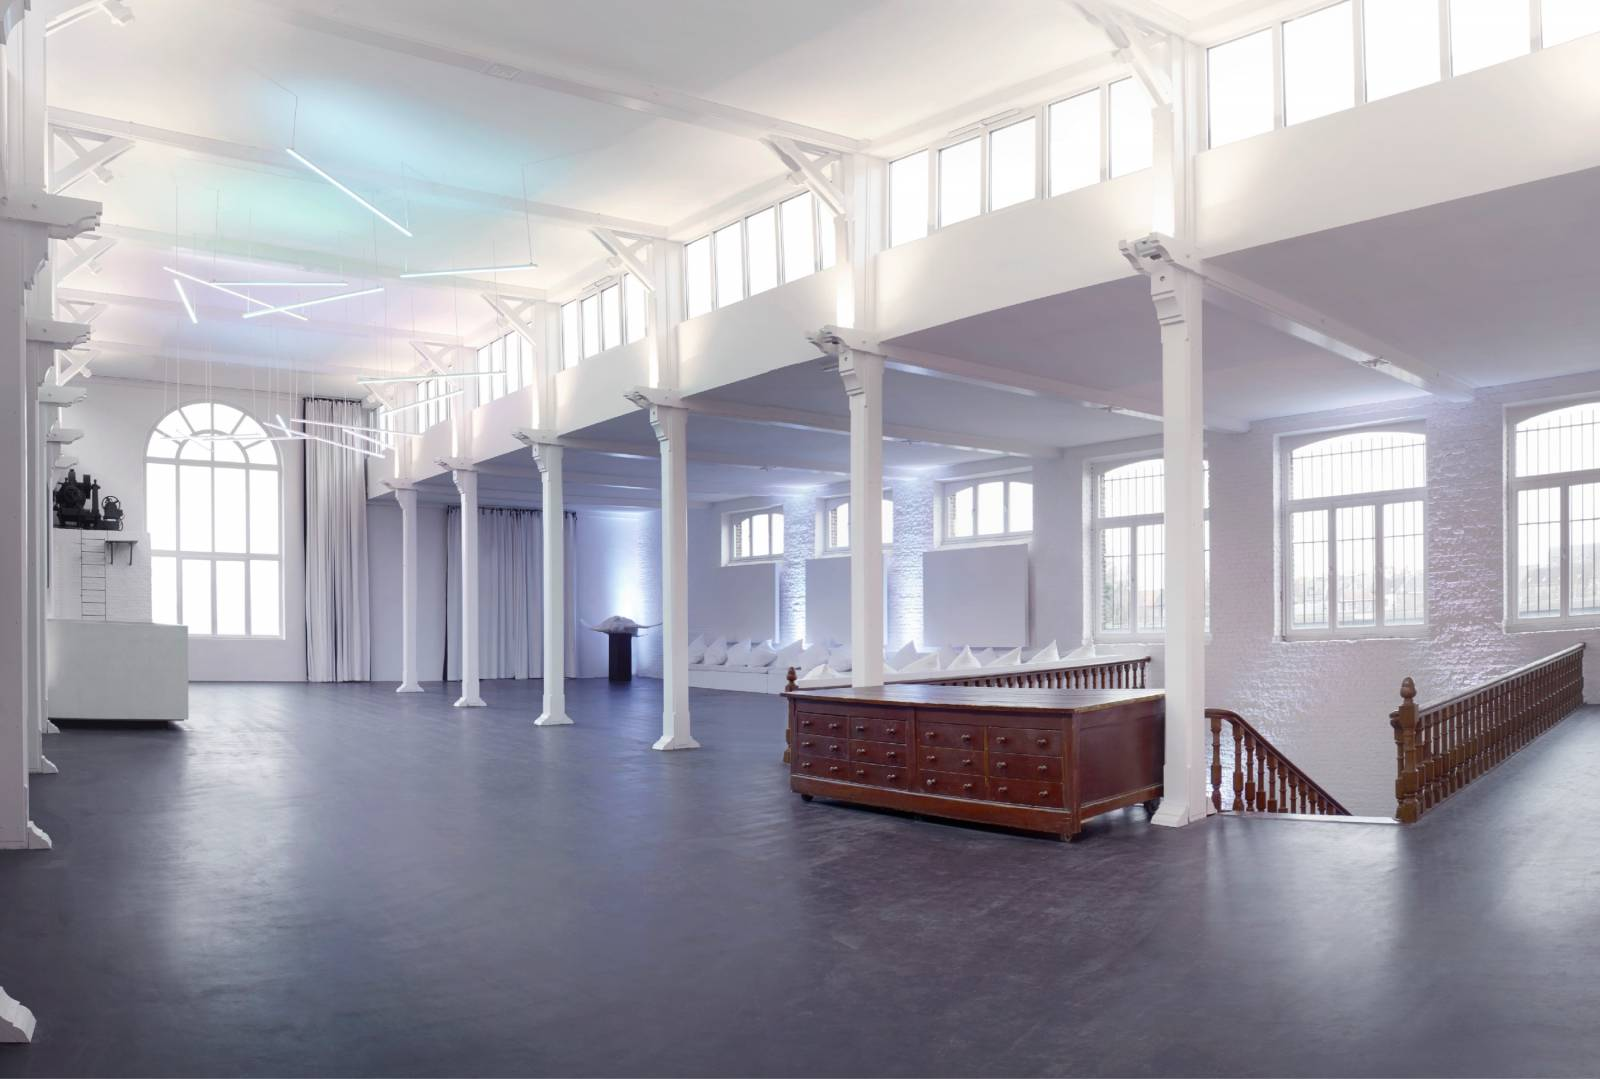 Zaal Lux - Feestzaal -  House of Weddings - 33